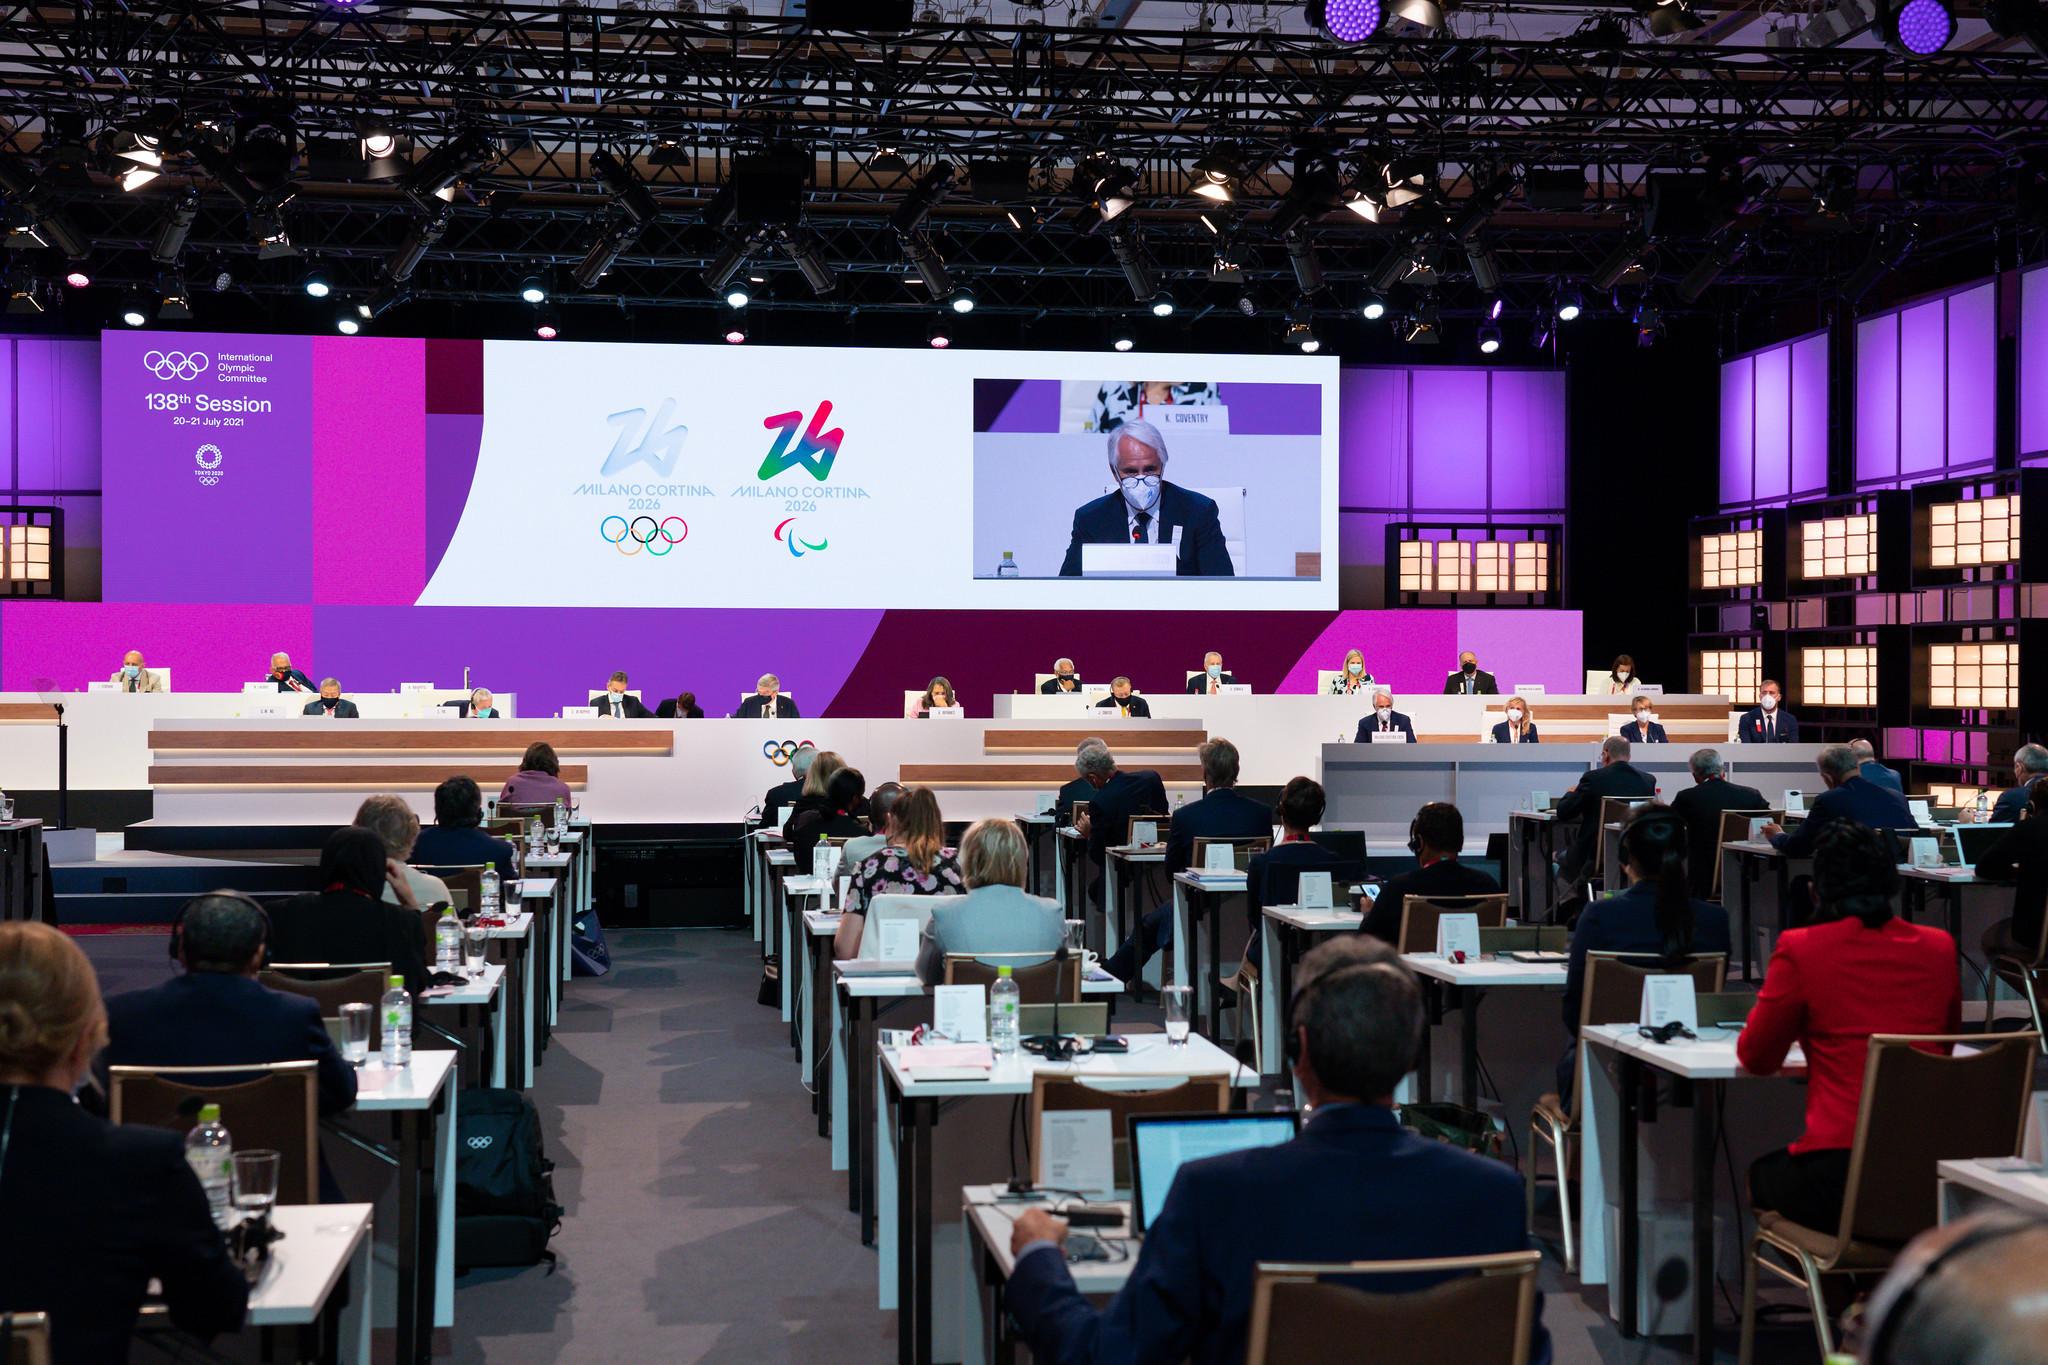 Several options remain under consideration for Milan Cortina 2026 speed skating venue